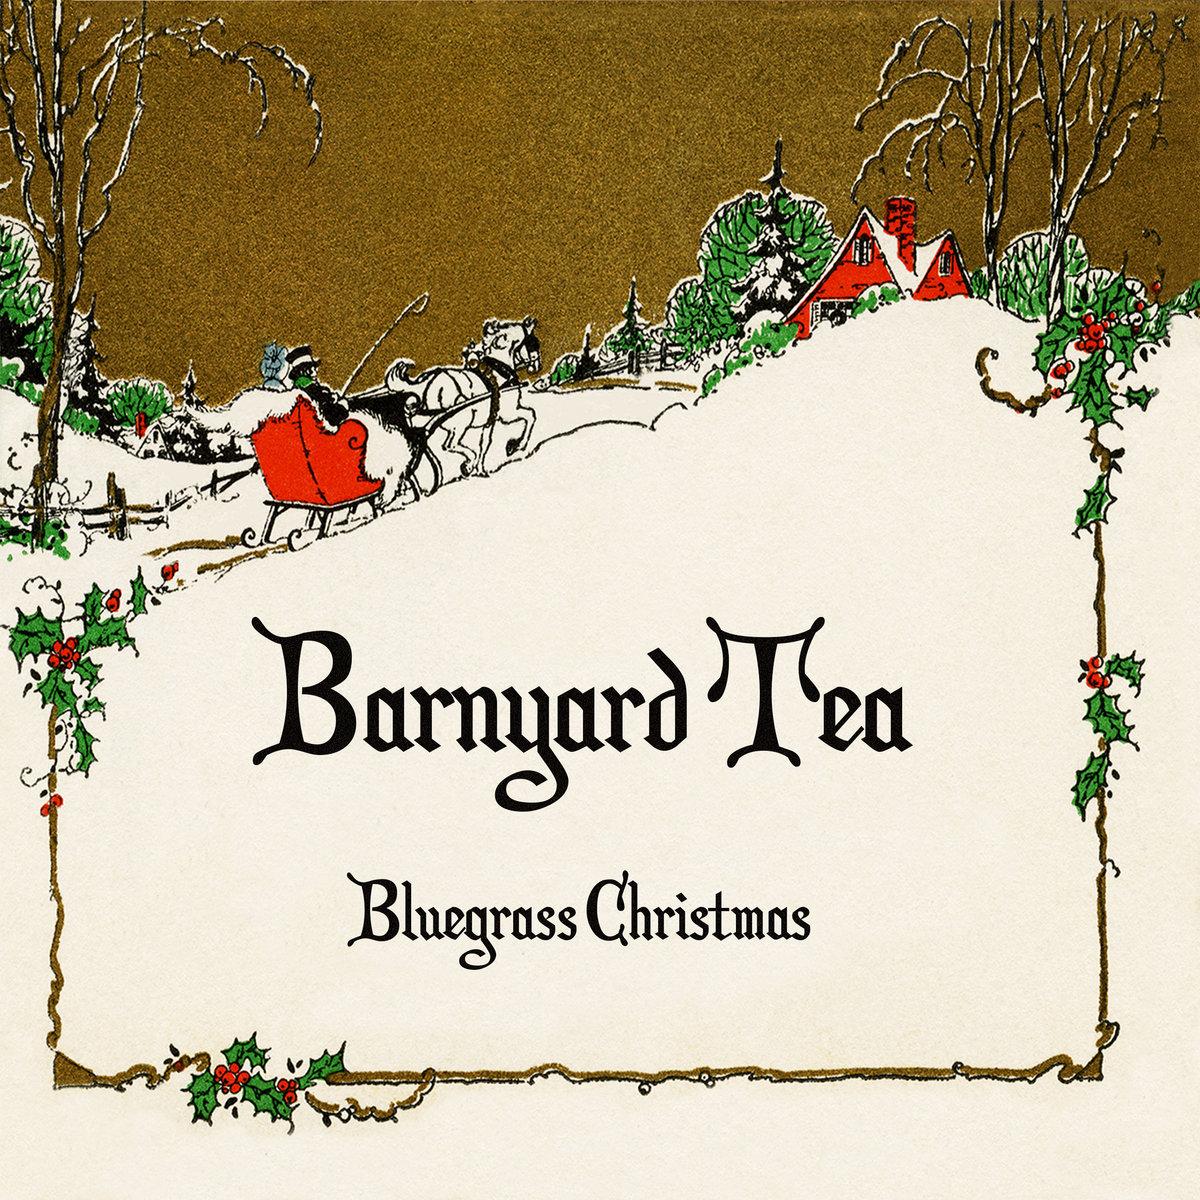 barnyard tea image - Bluegrass Christmas